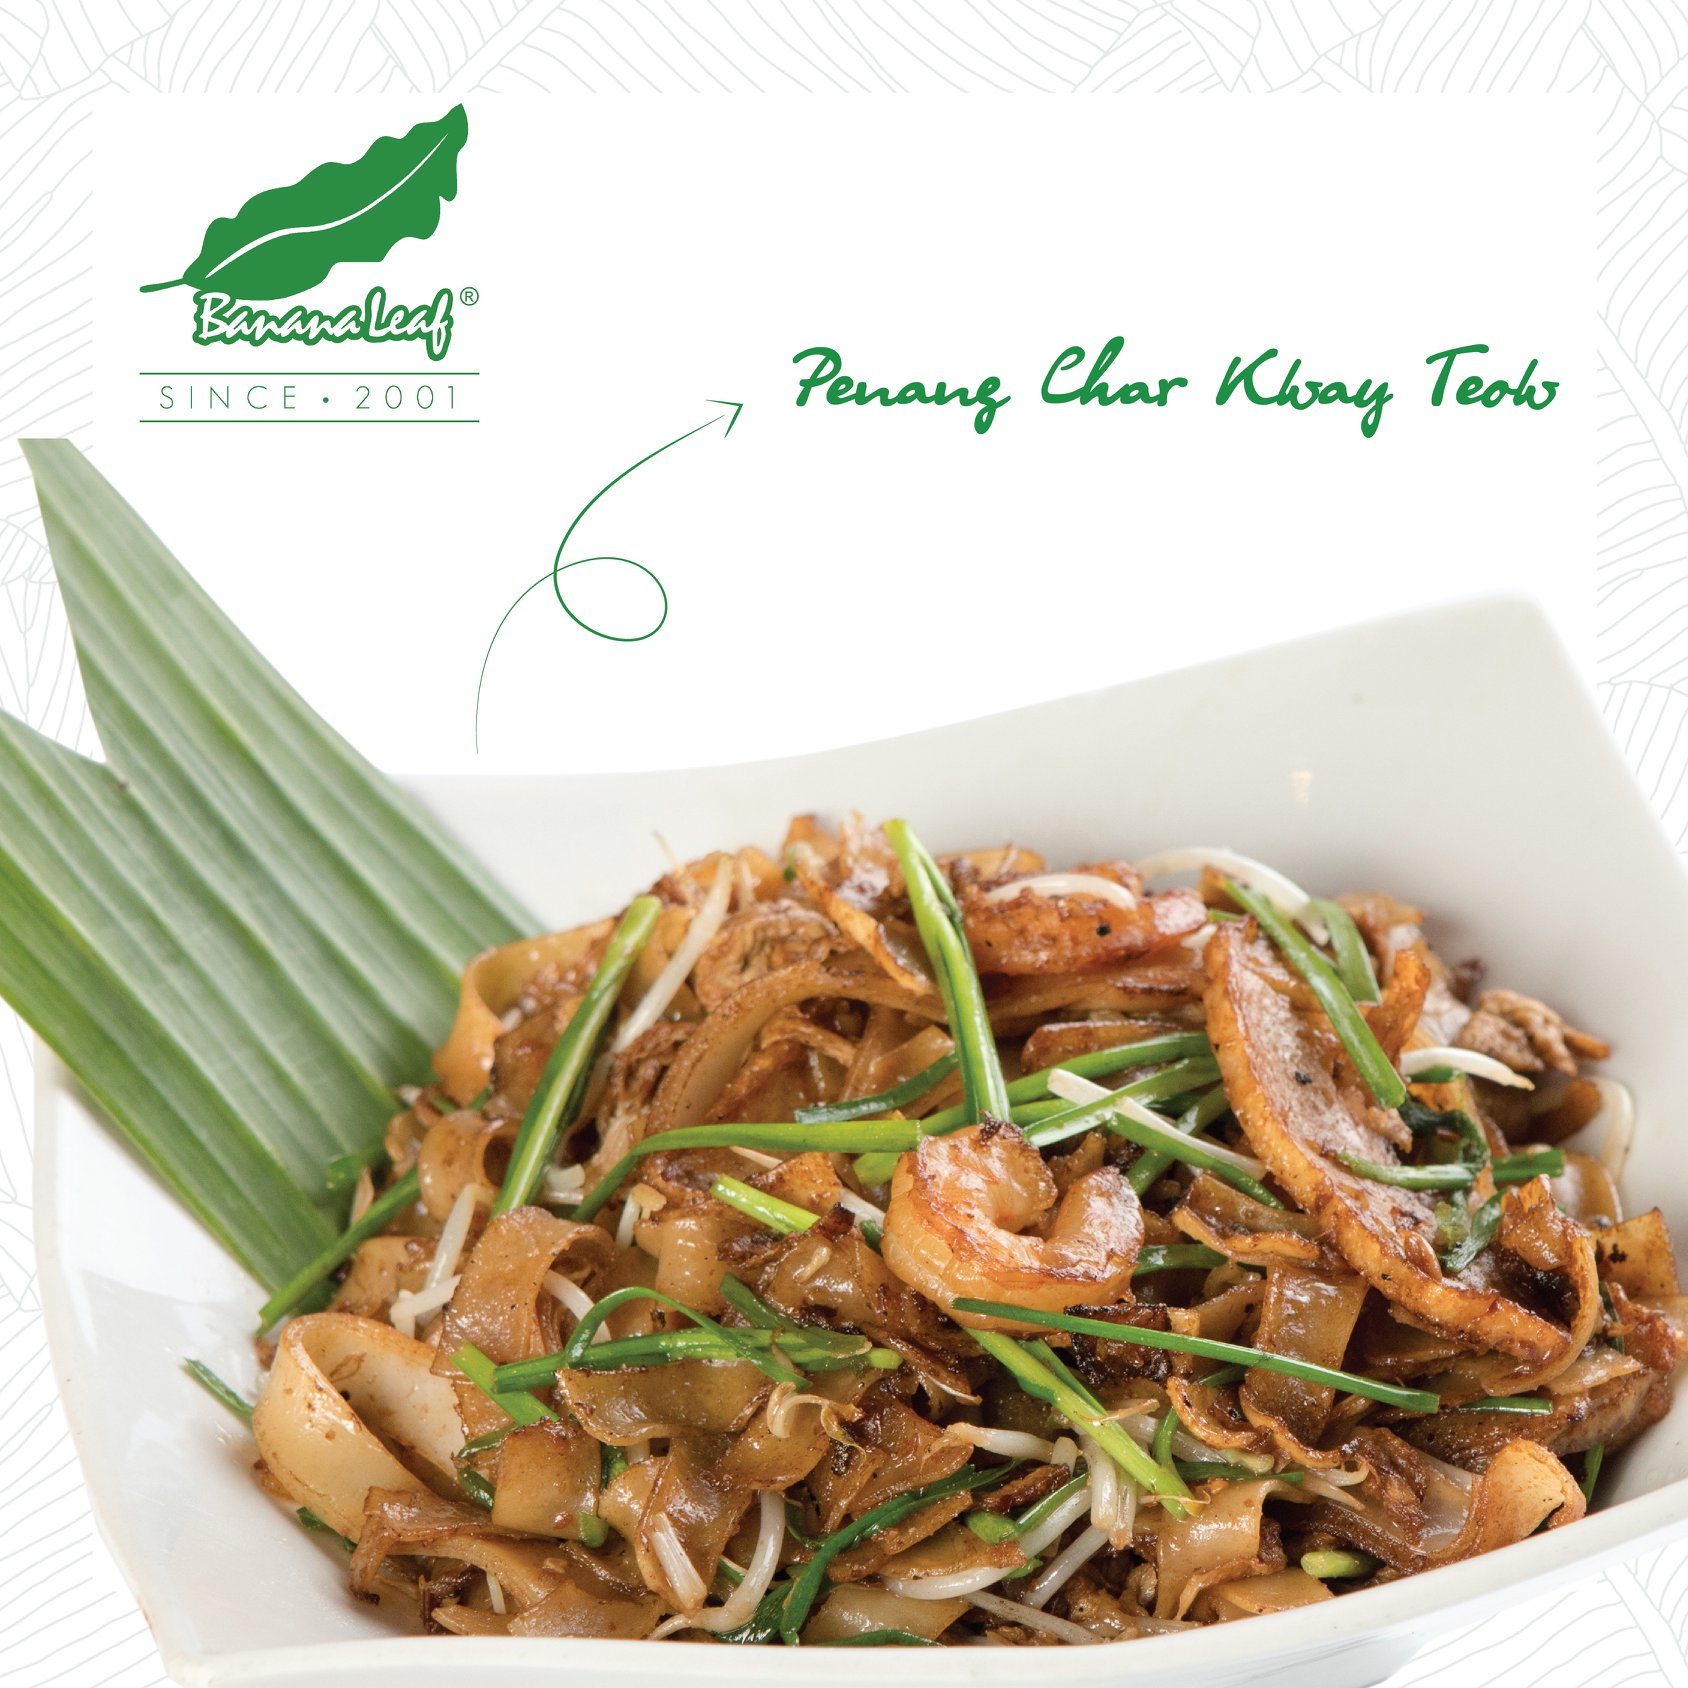 A photo of Banana Leaf's Penang Char Kway Teow dish